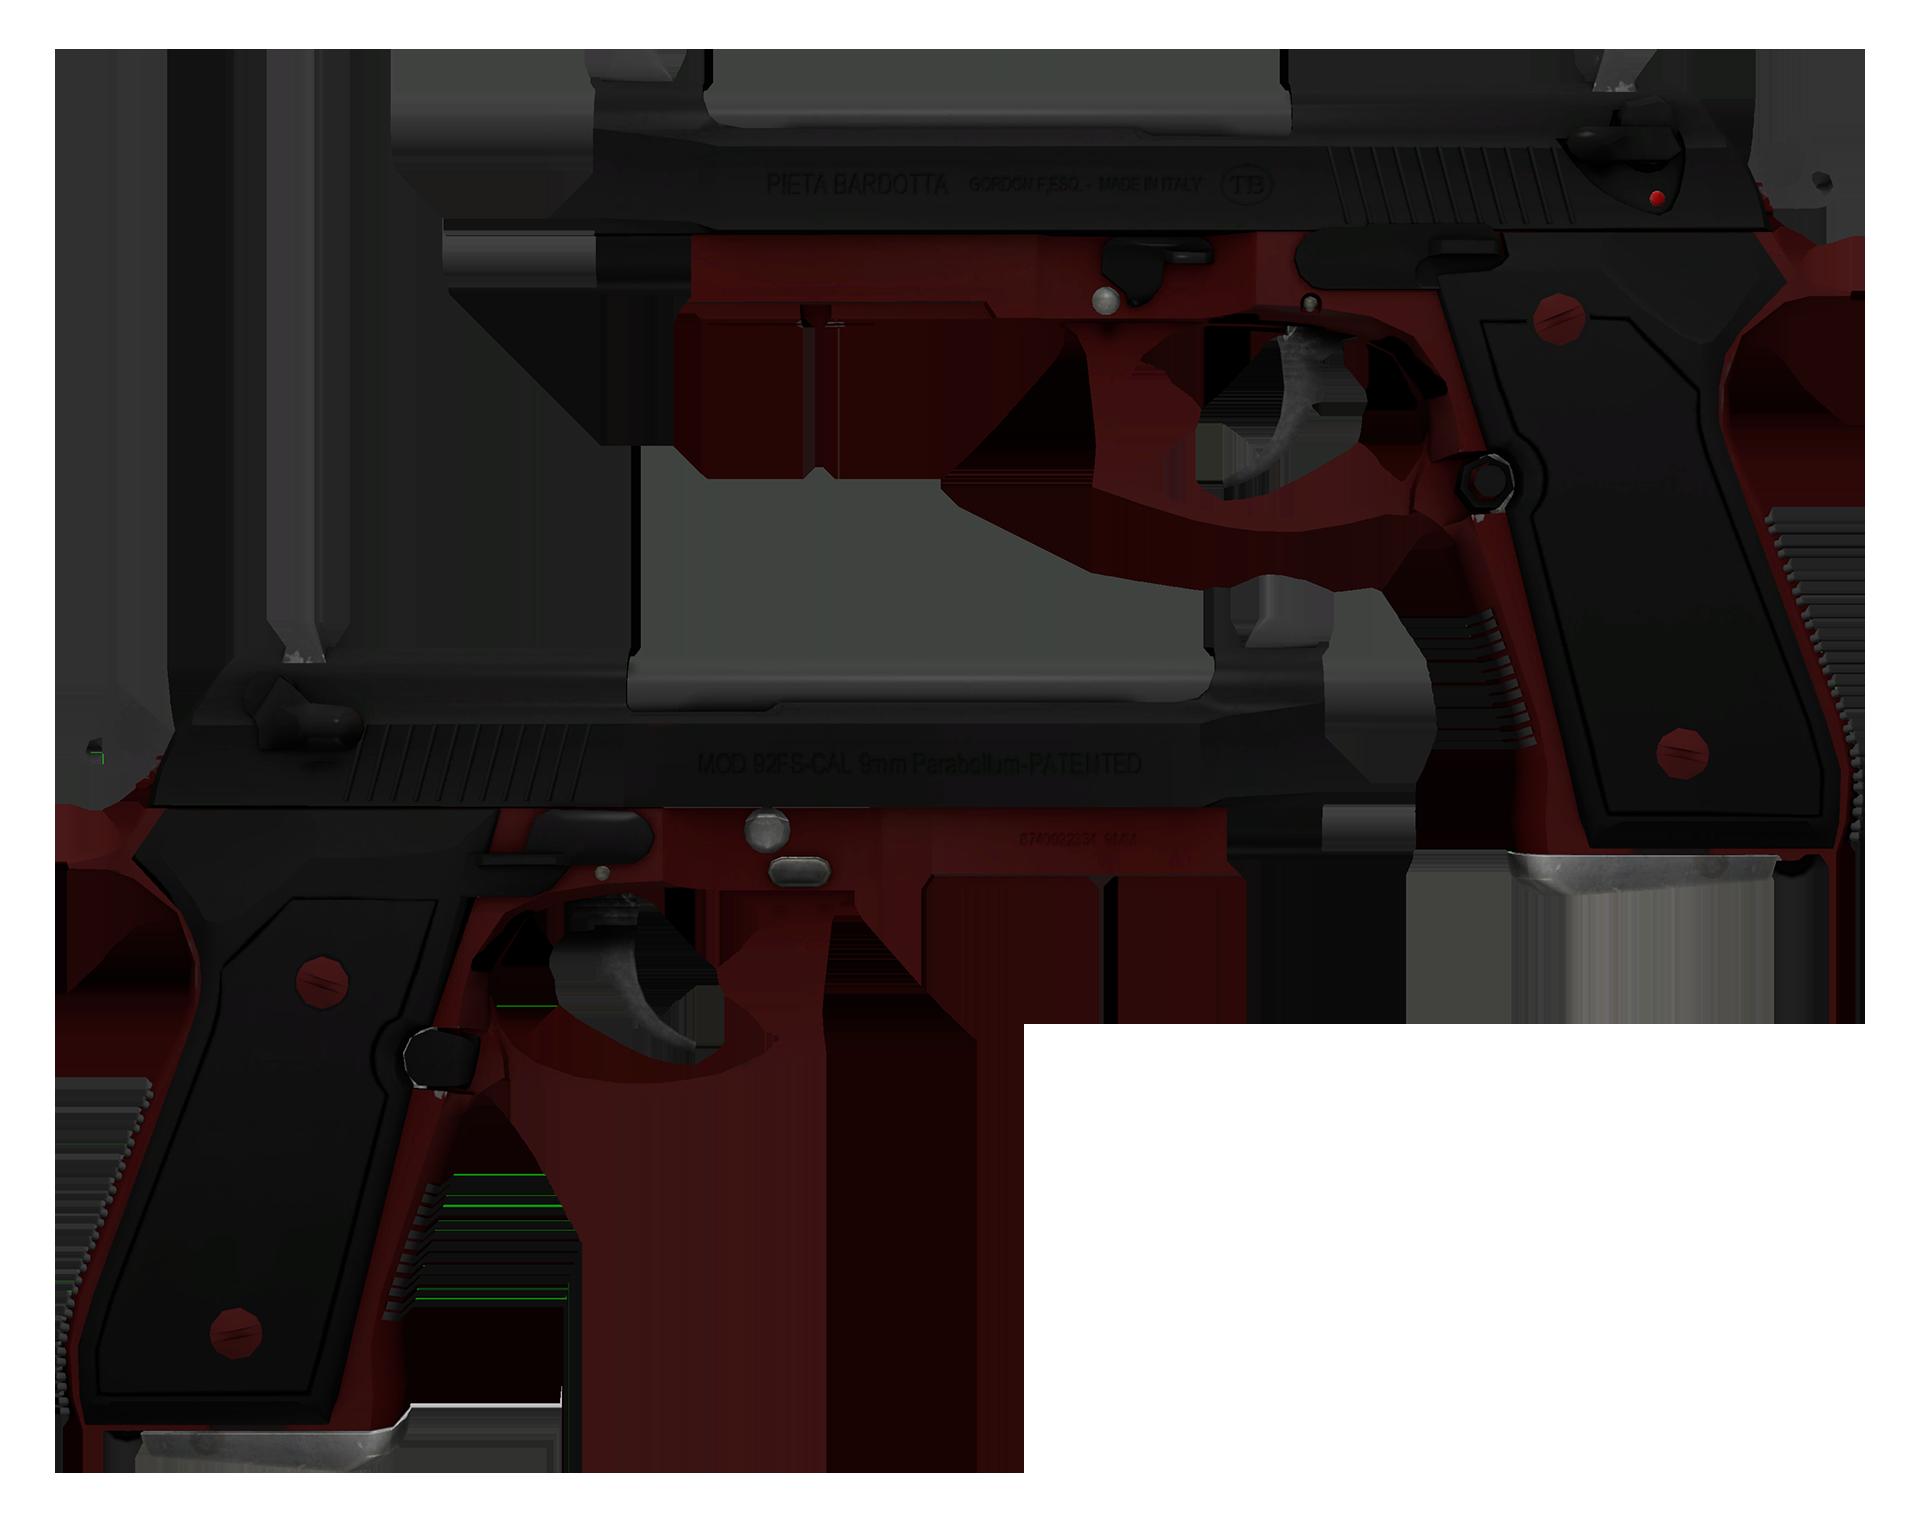 Dual Berettas Panther Large Rendering